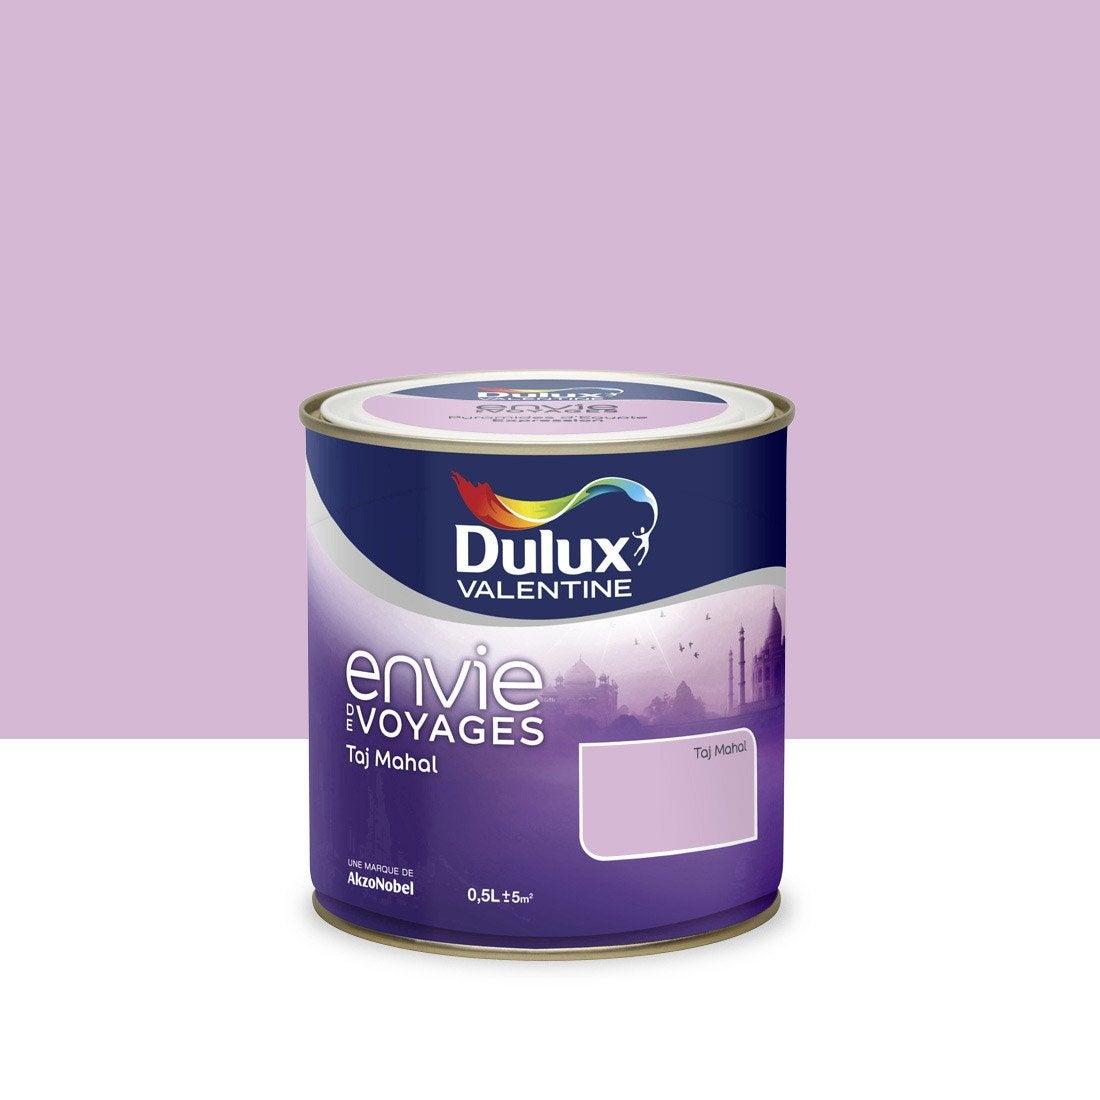 Good peinture envie leroy merlin 8 69875463 1 0 - Peinture isolante leroy merlin ...